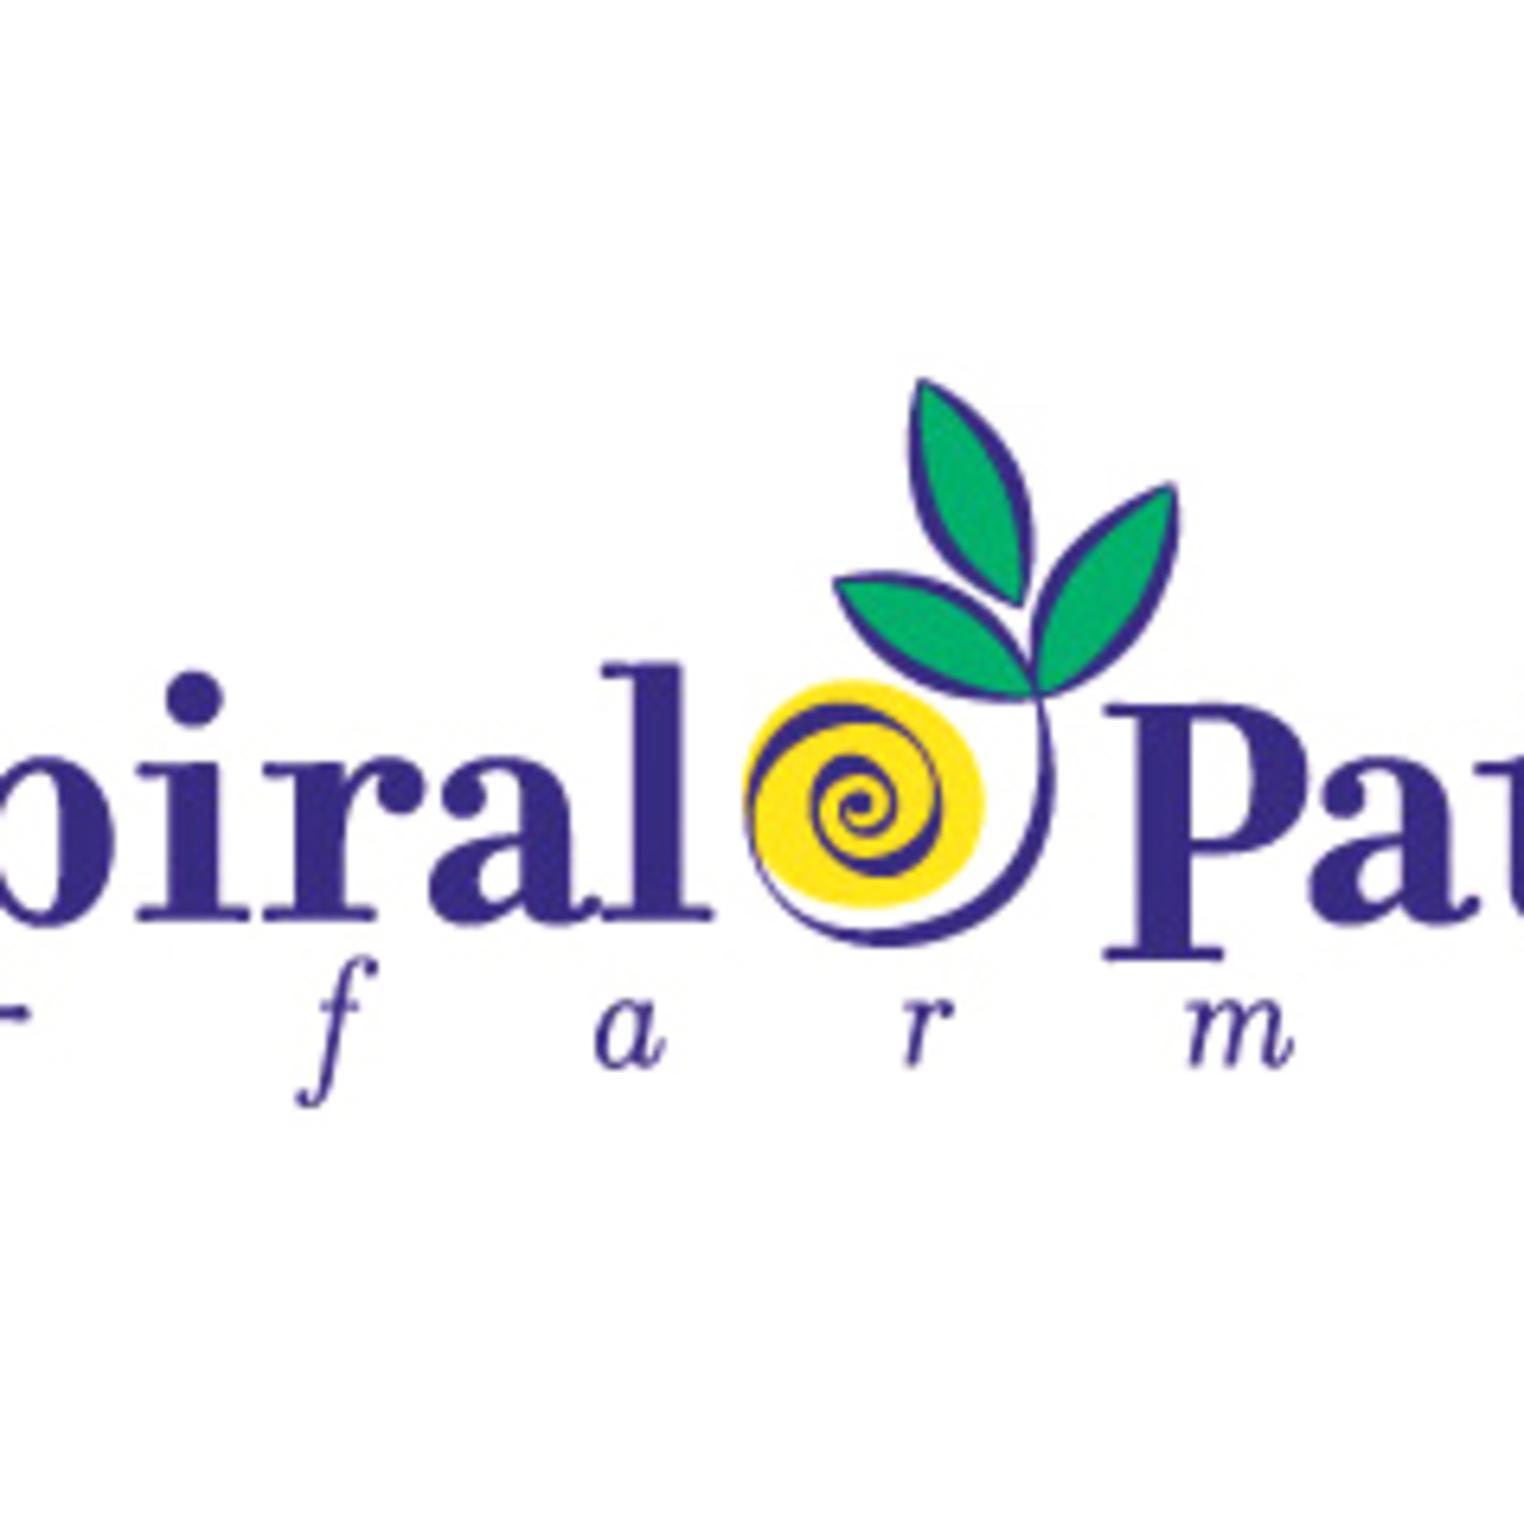 Spiral Path Farm LLC